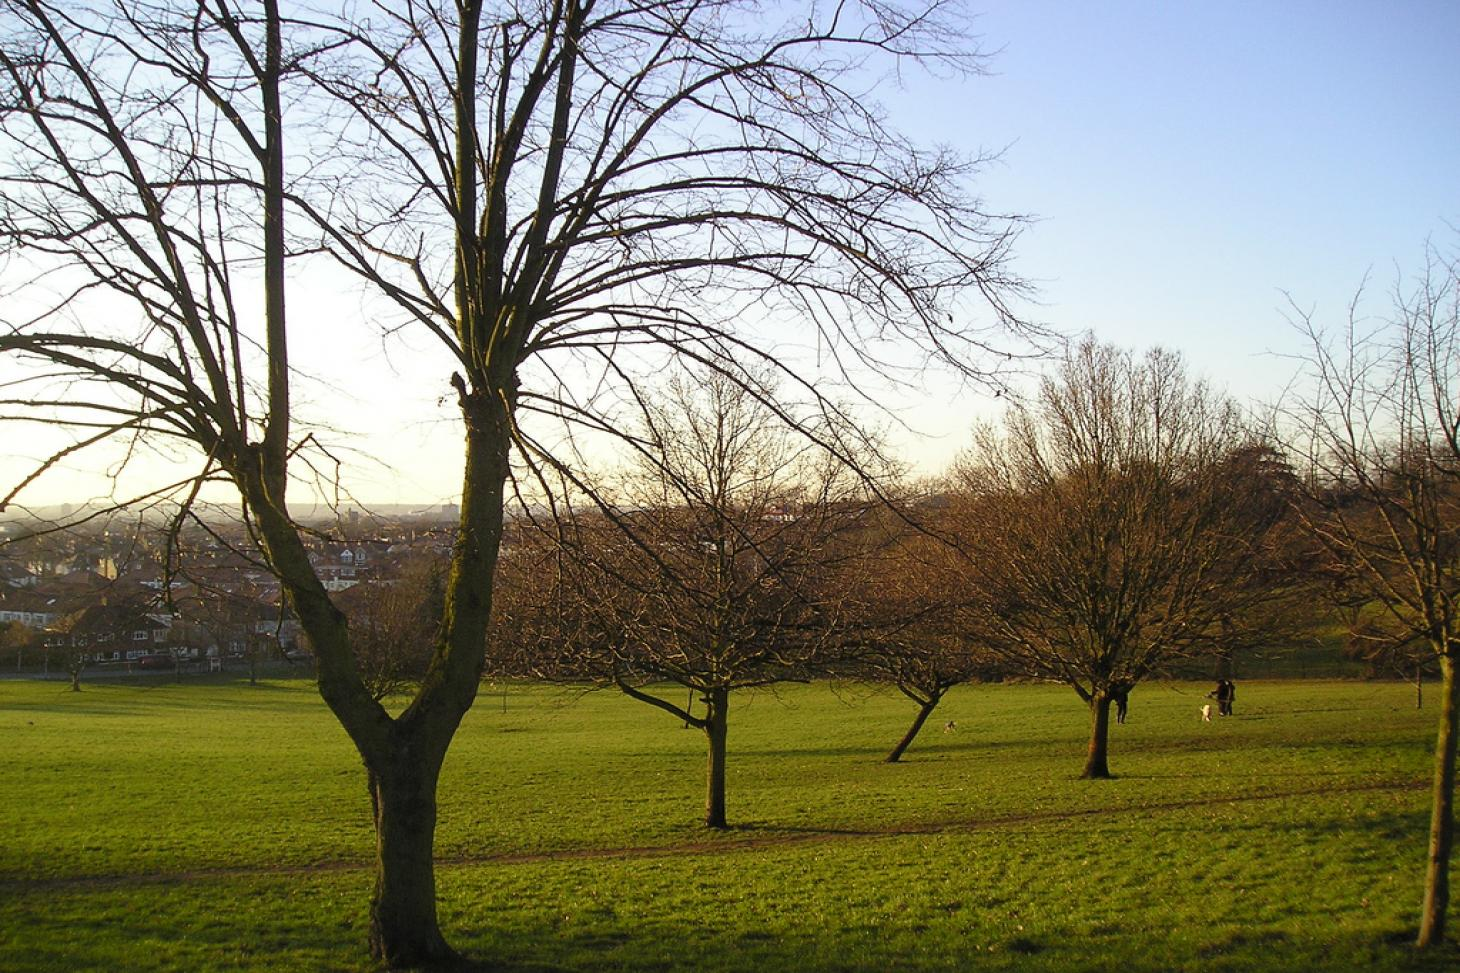 Norwood Grove Recreation Ground Outdoor | Hard (macadam) tennis court